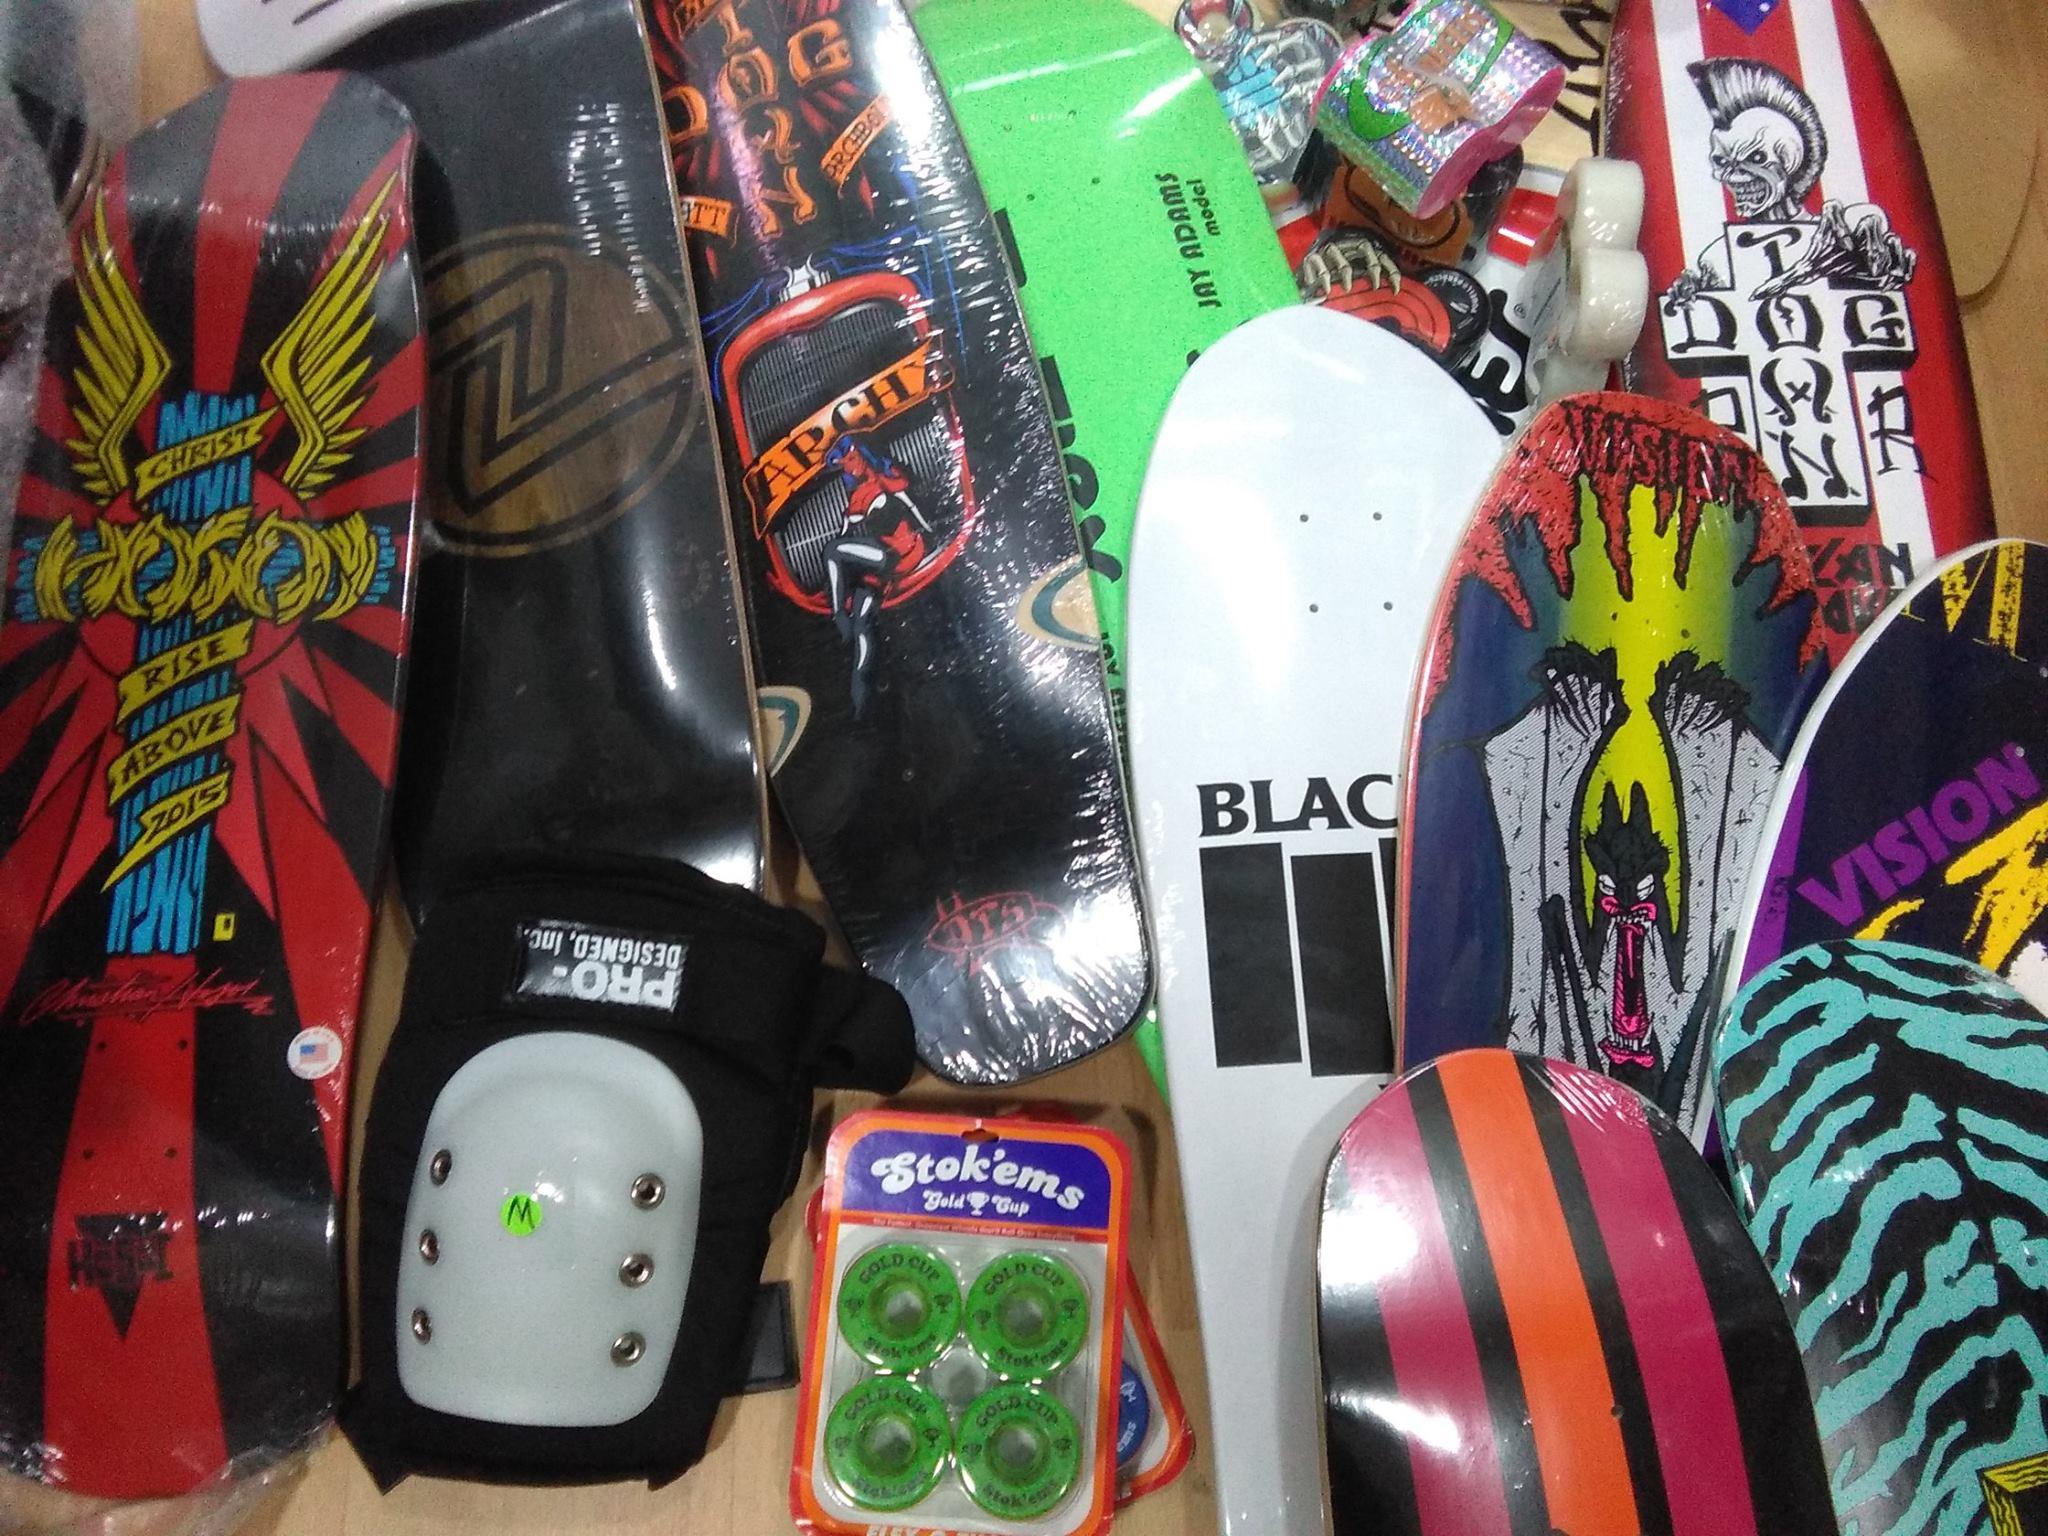 Pop skate shop